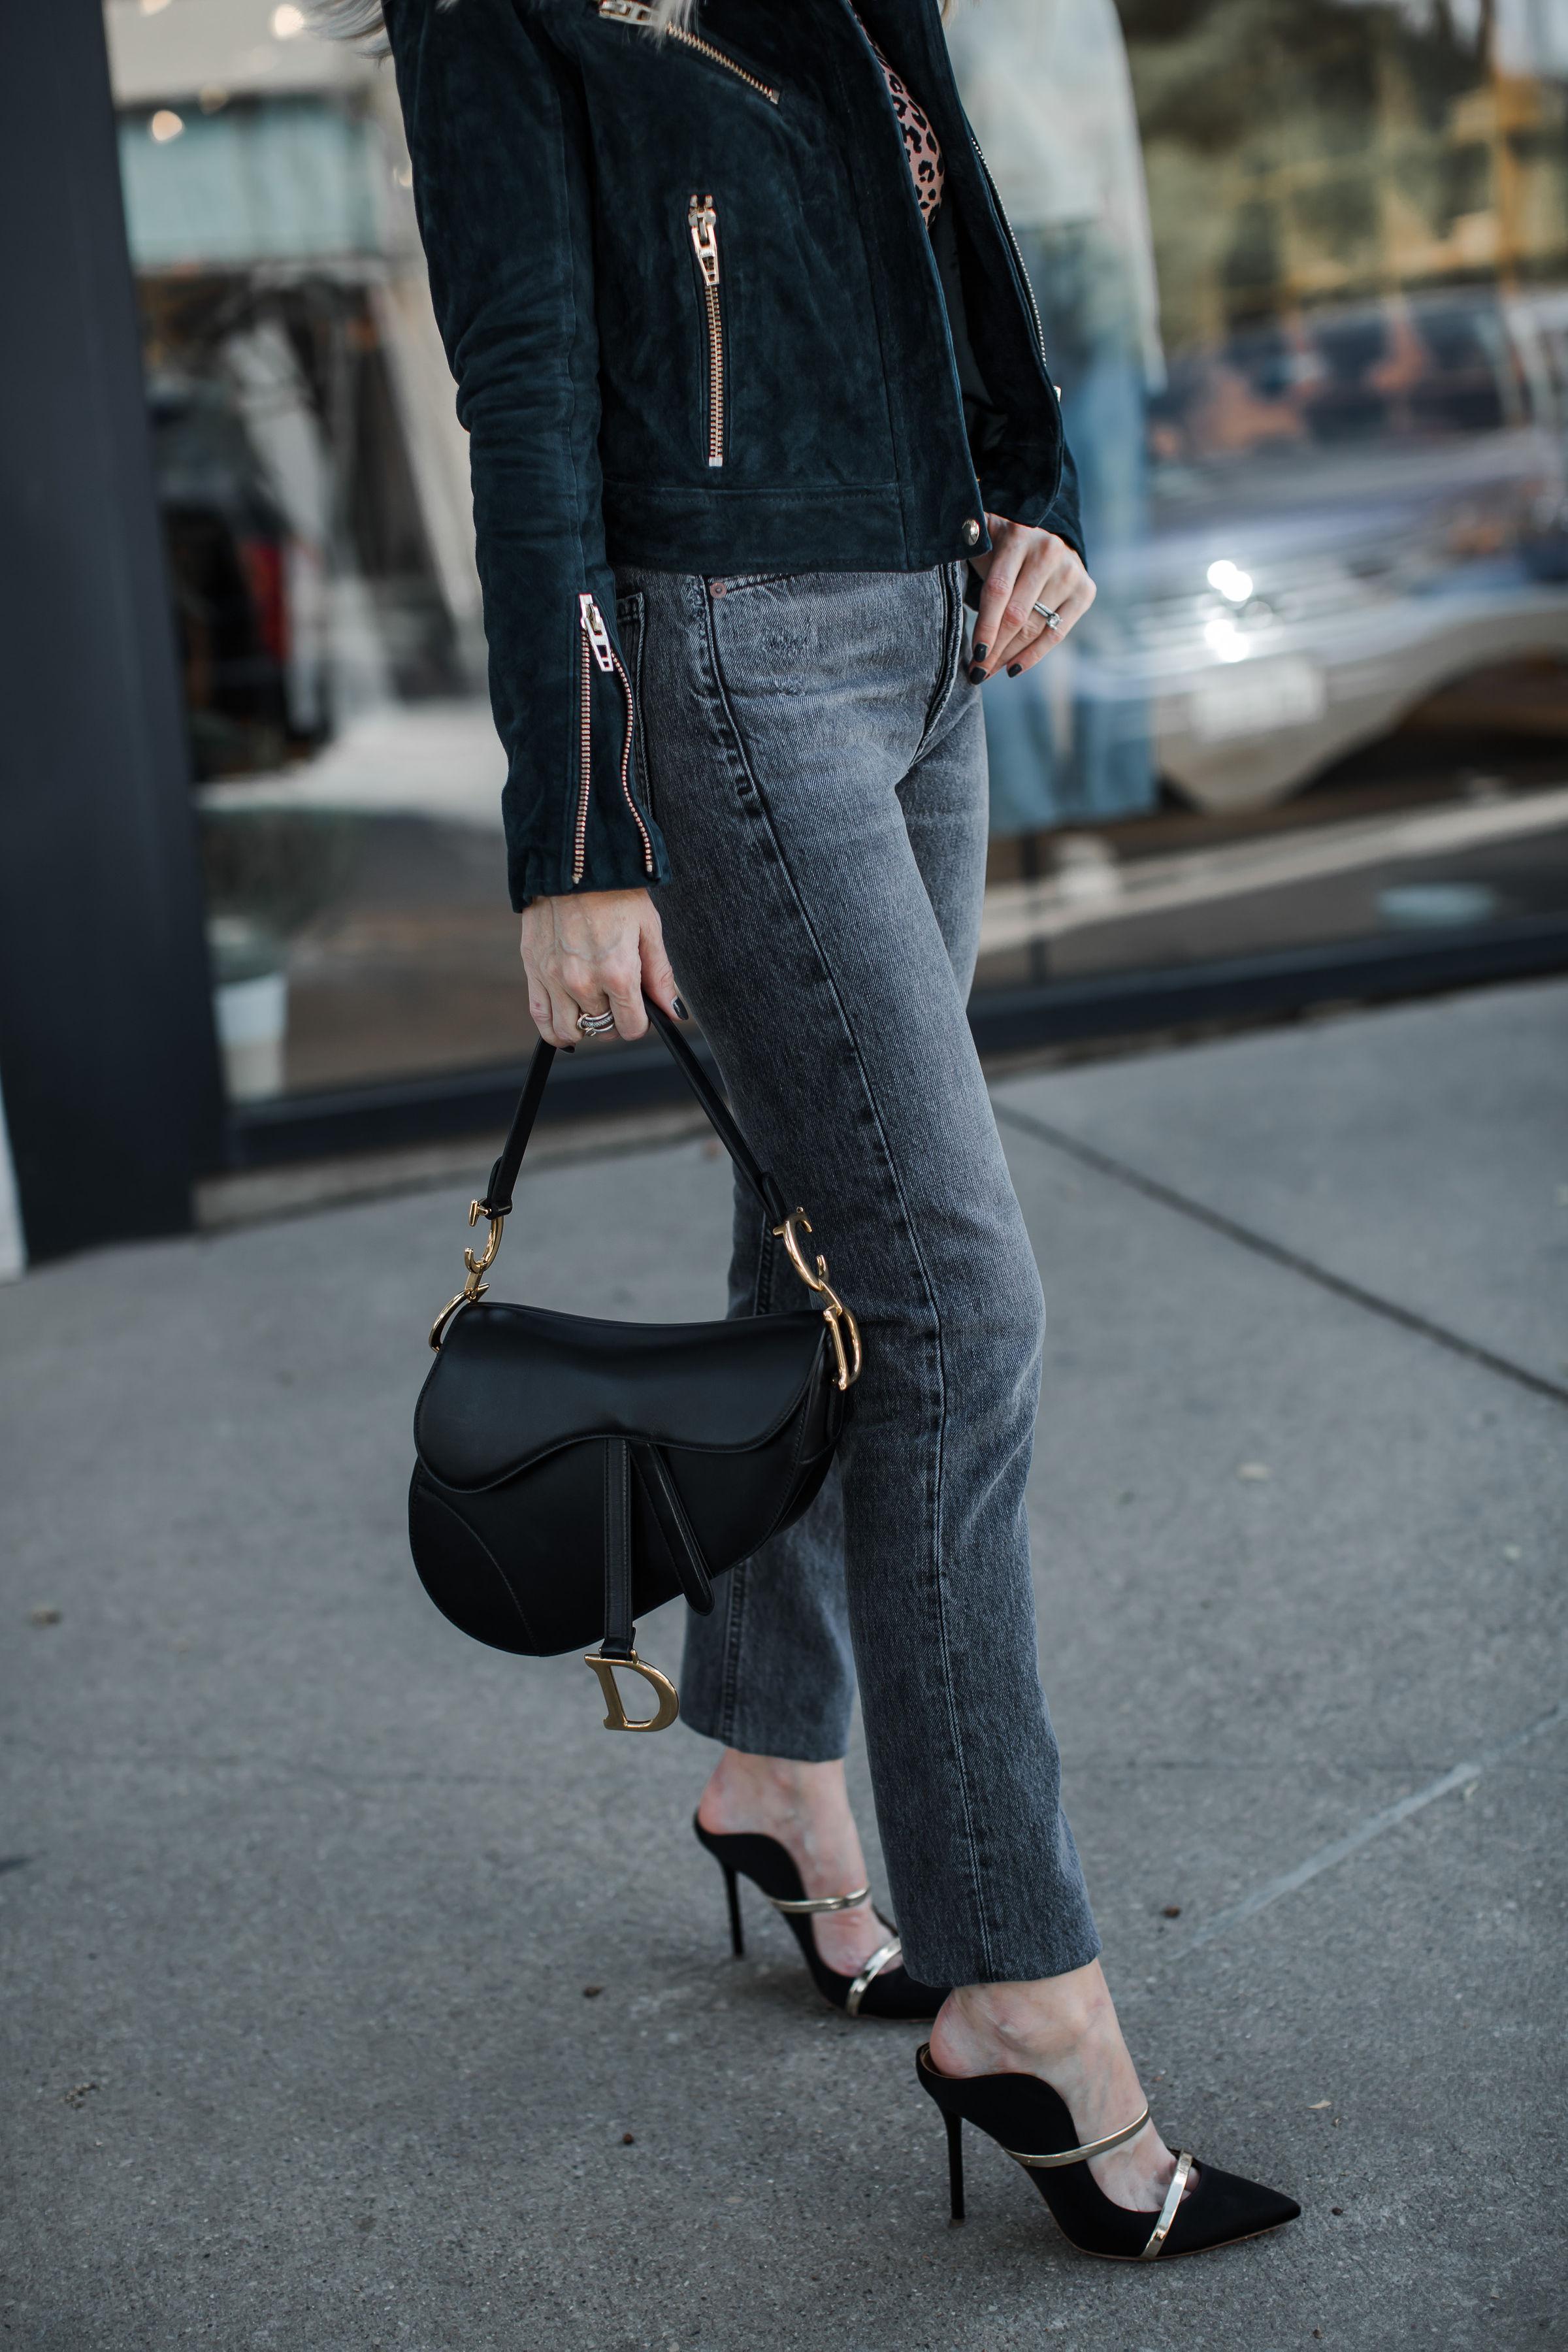 Dallas Influencer Carrying A Dior Saddle Bag